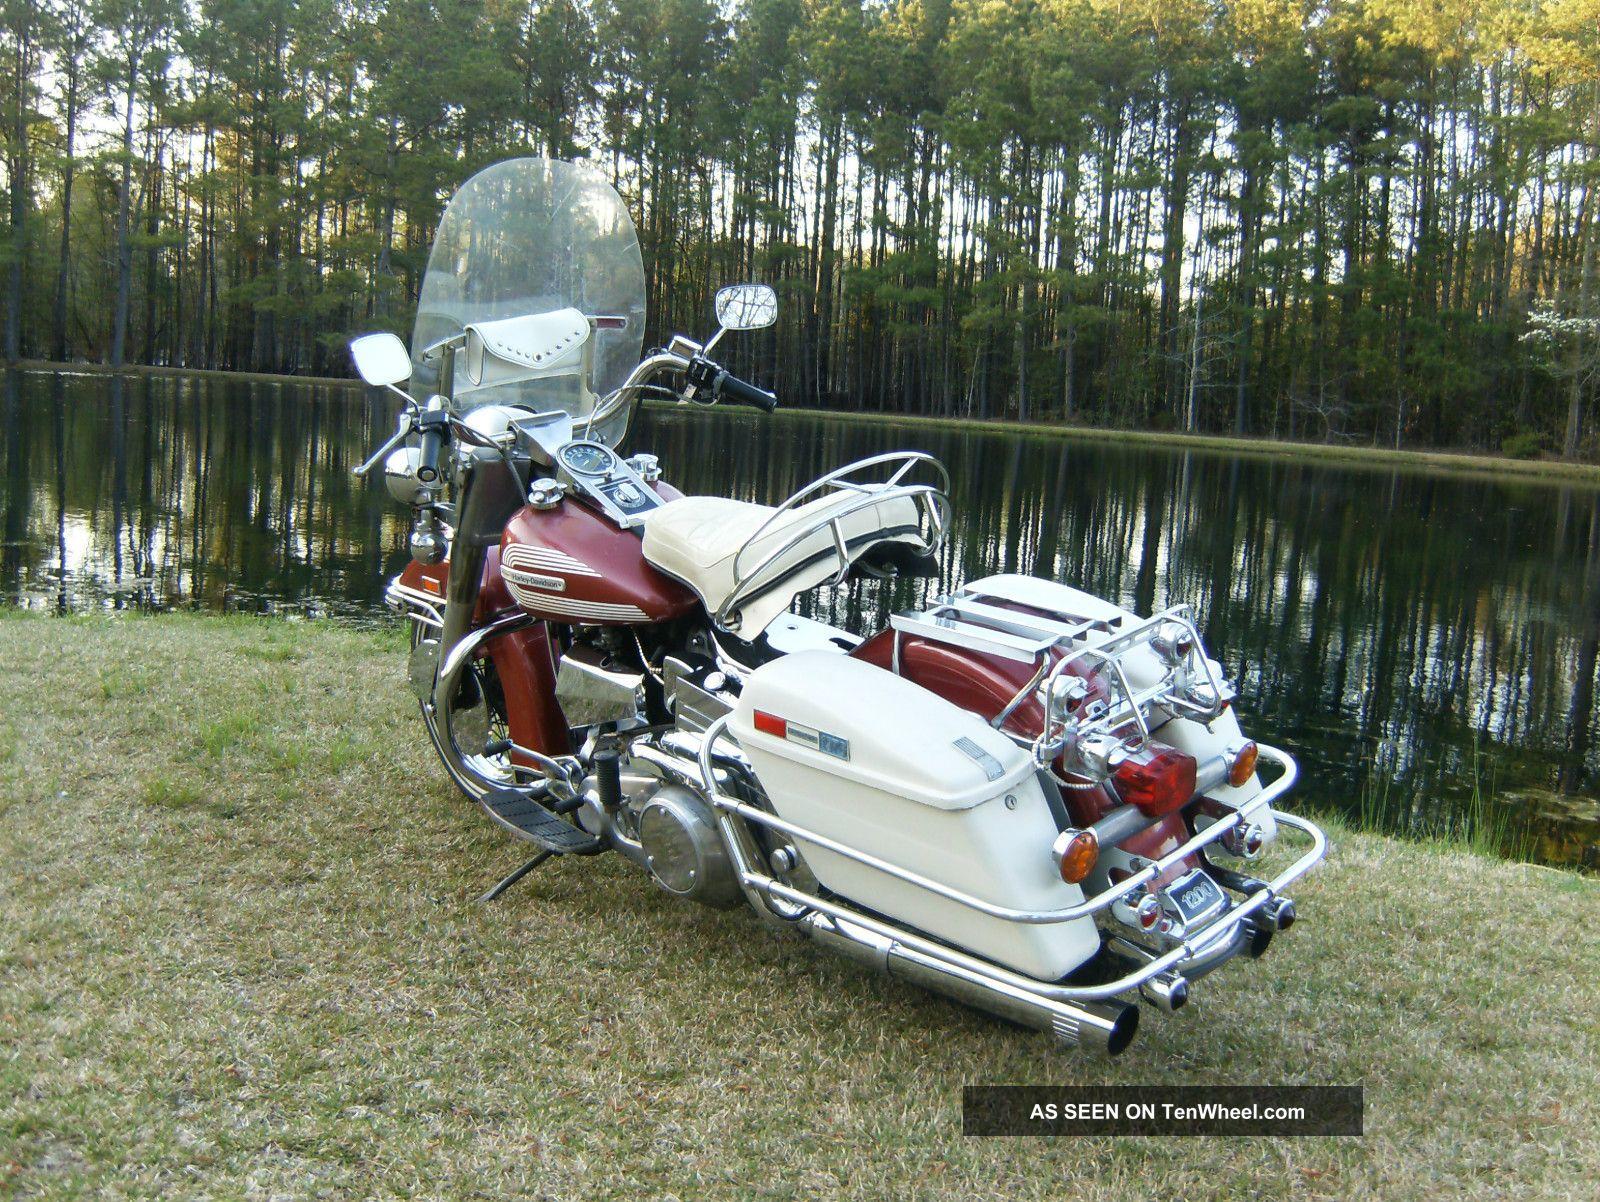 1976 Harley Davidson Flh Touring photo 5